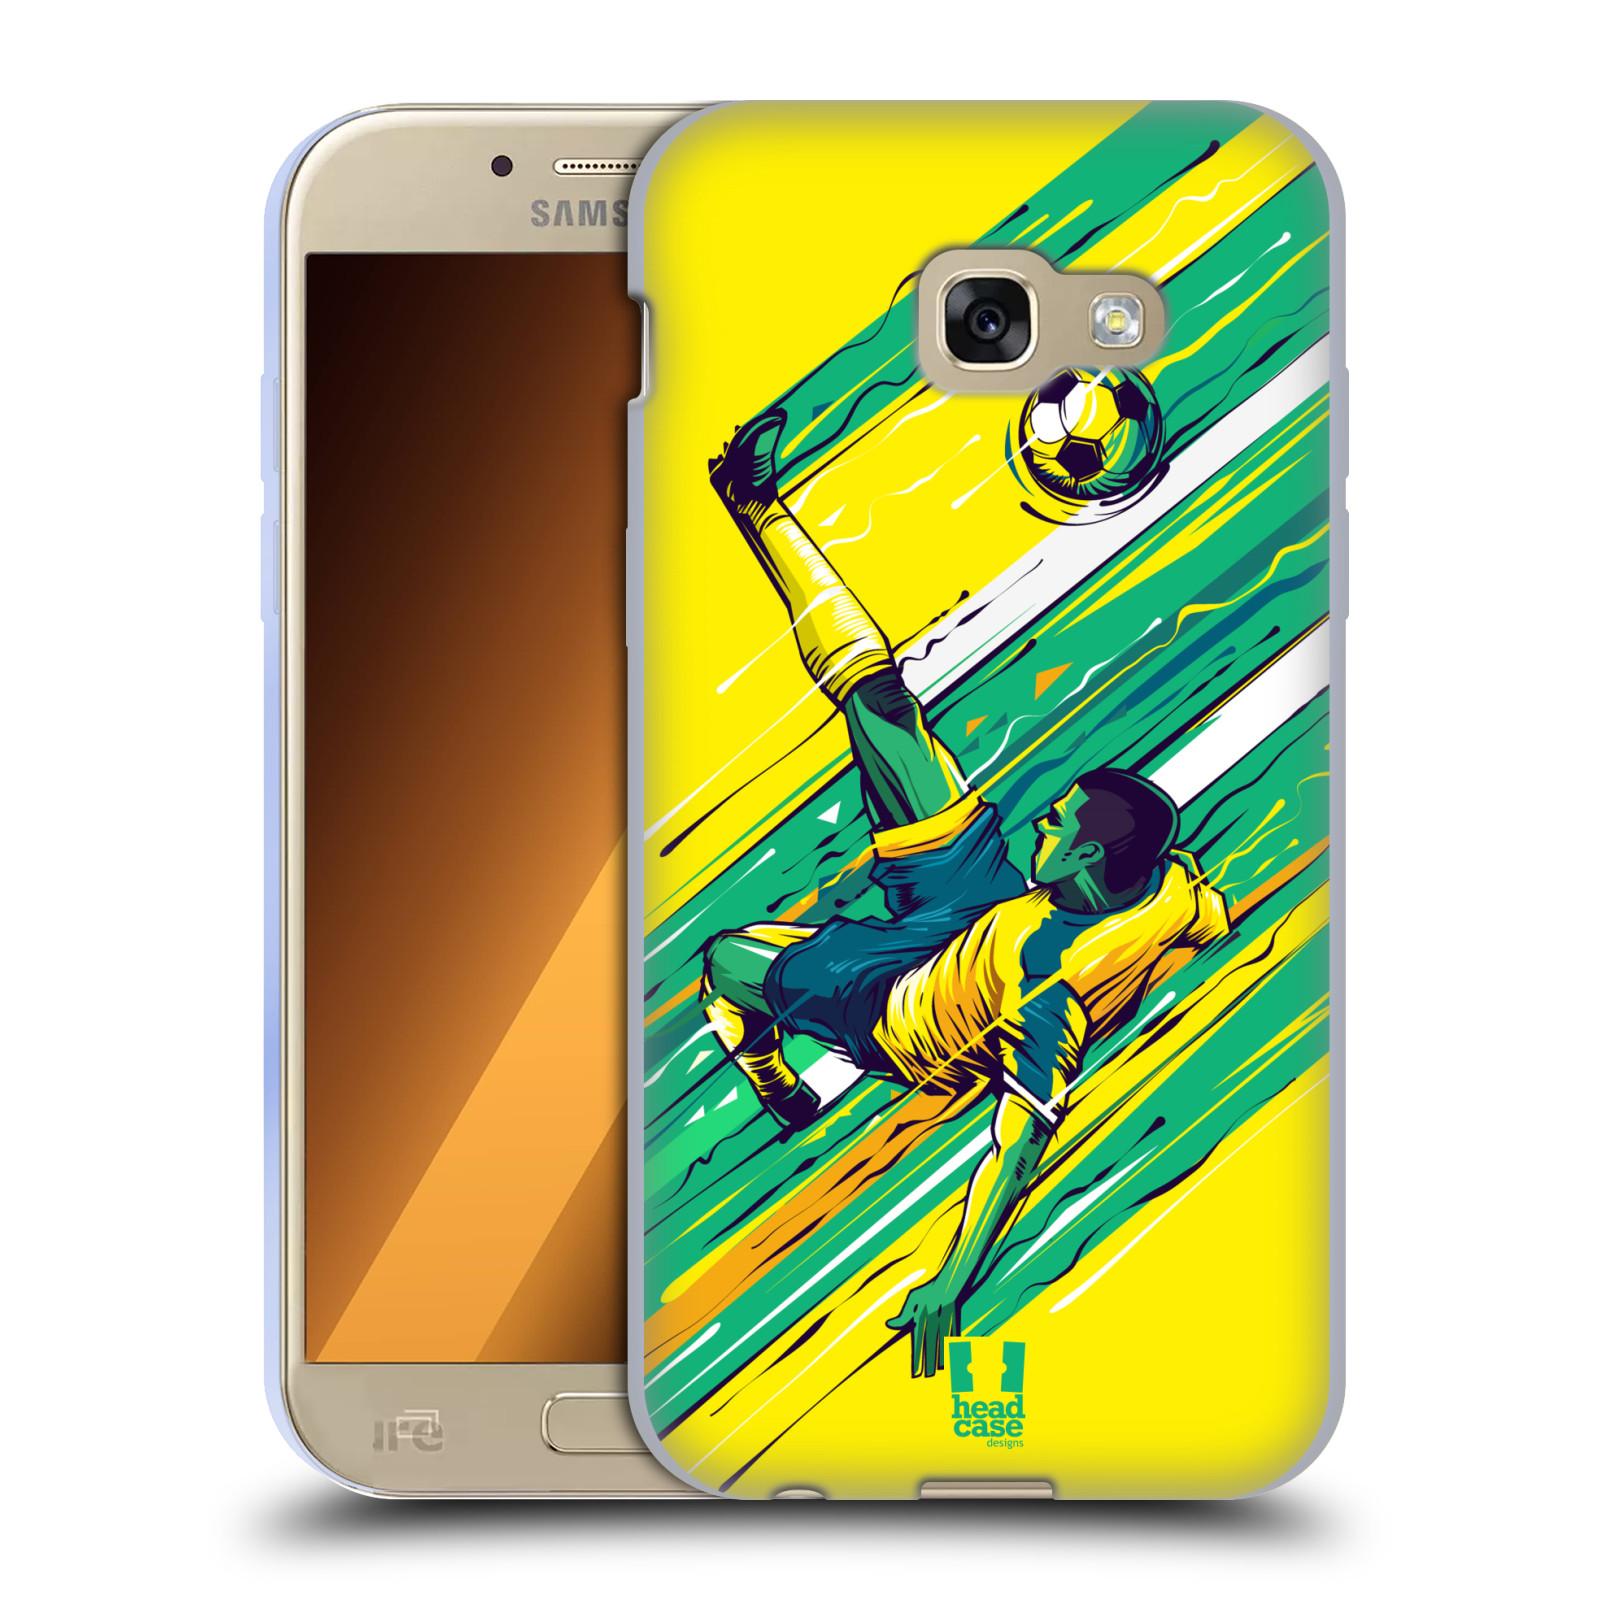 HEAD CASE silikonový obal na mobil Samsung Galaxy A5 2017 (A520) Sport fotbal kreslený nůžky